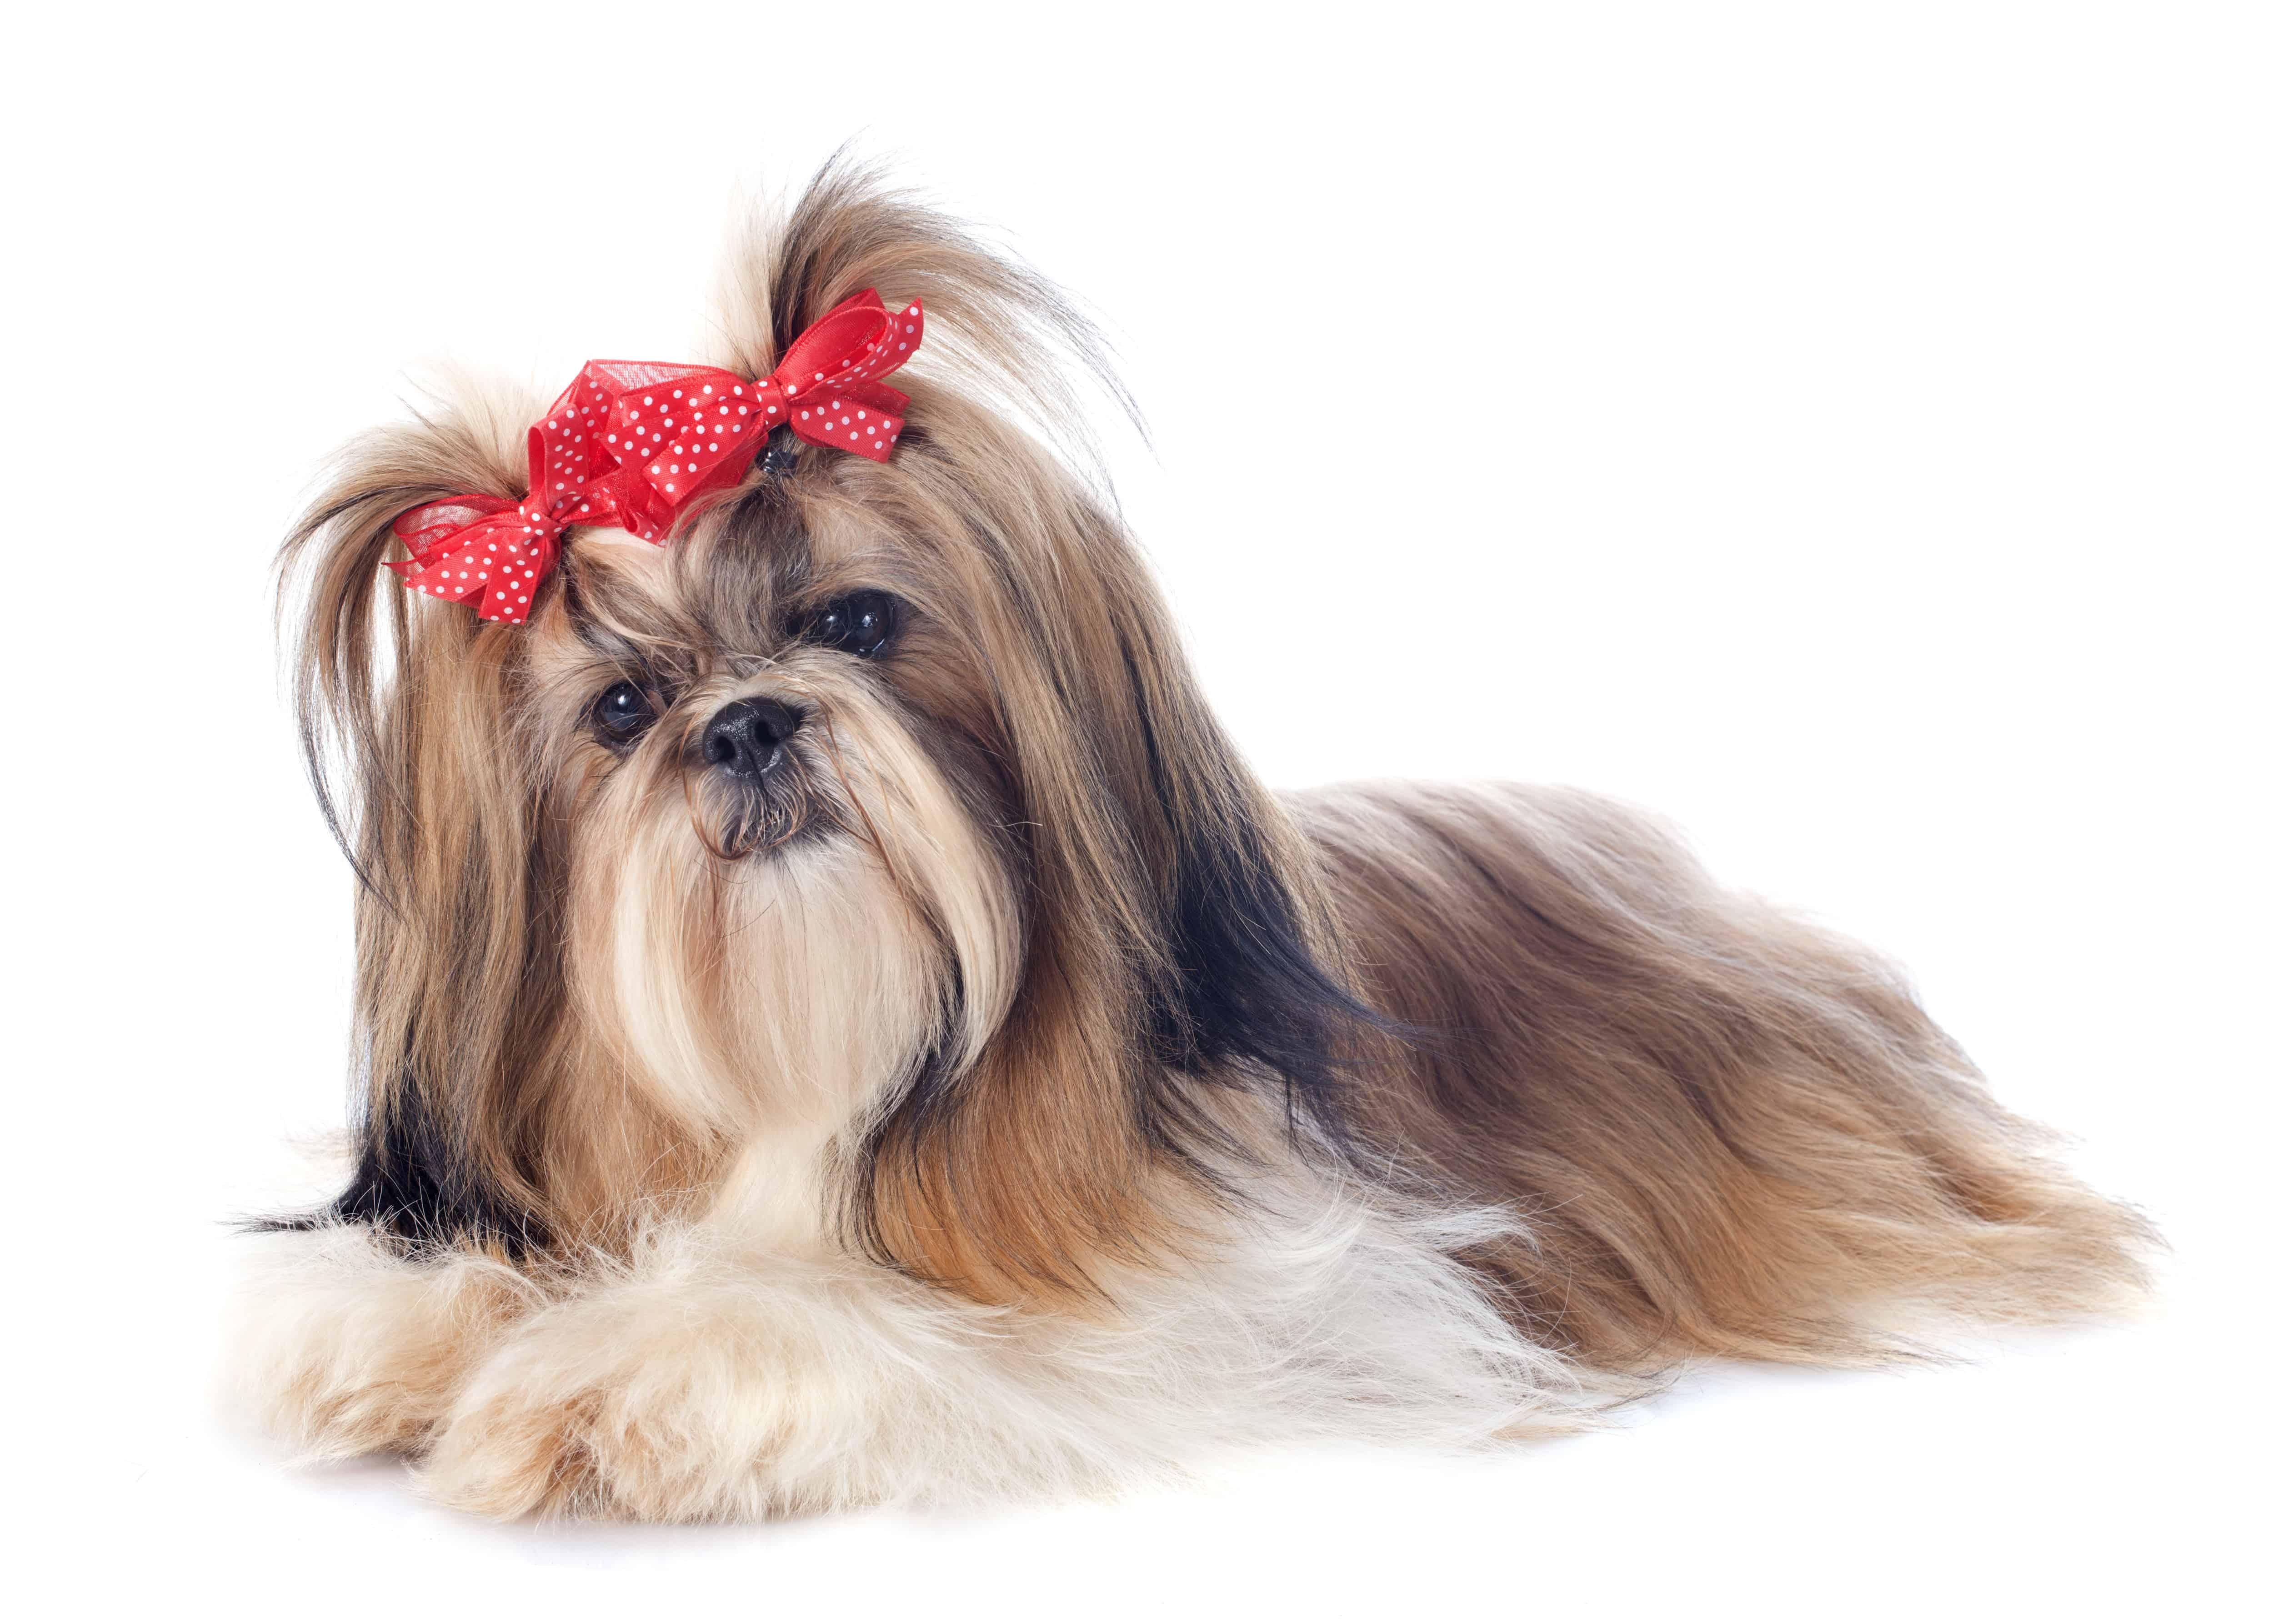 Shih Tzu Dog Breed Info, stats (Photos & Videos) - PetCare ...